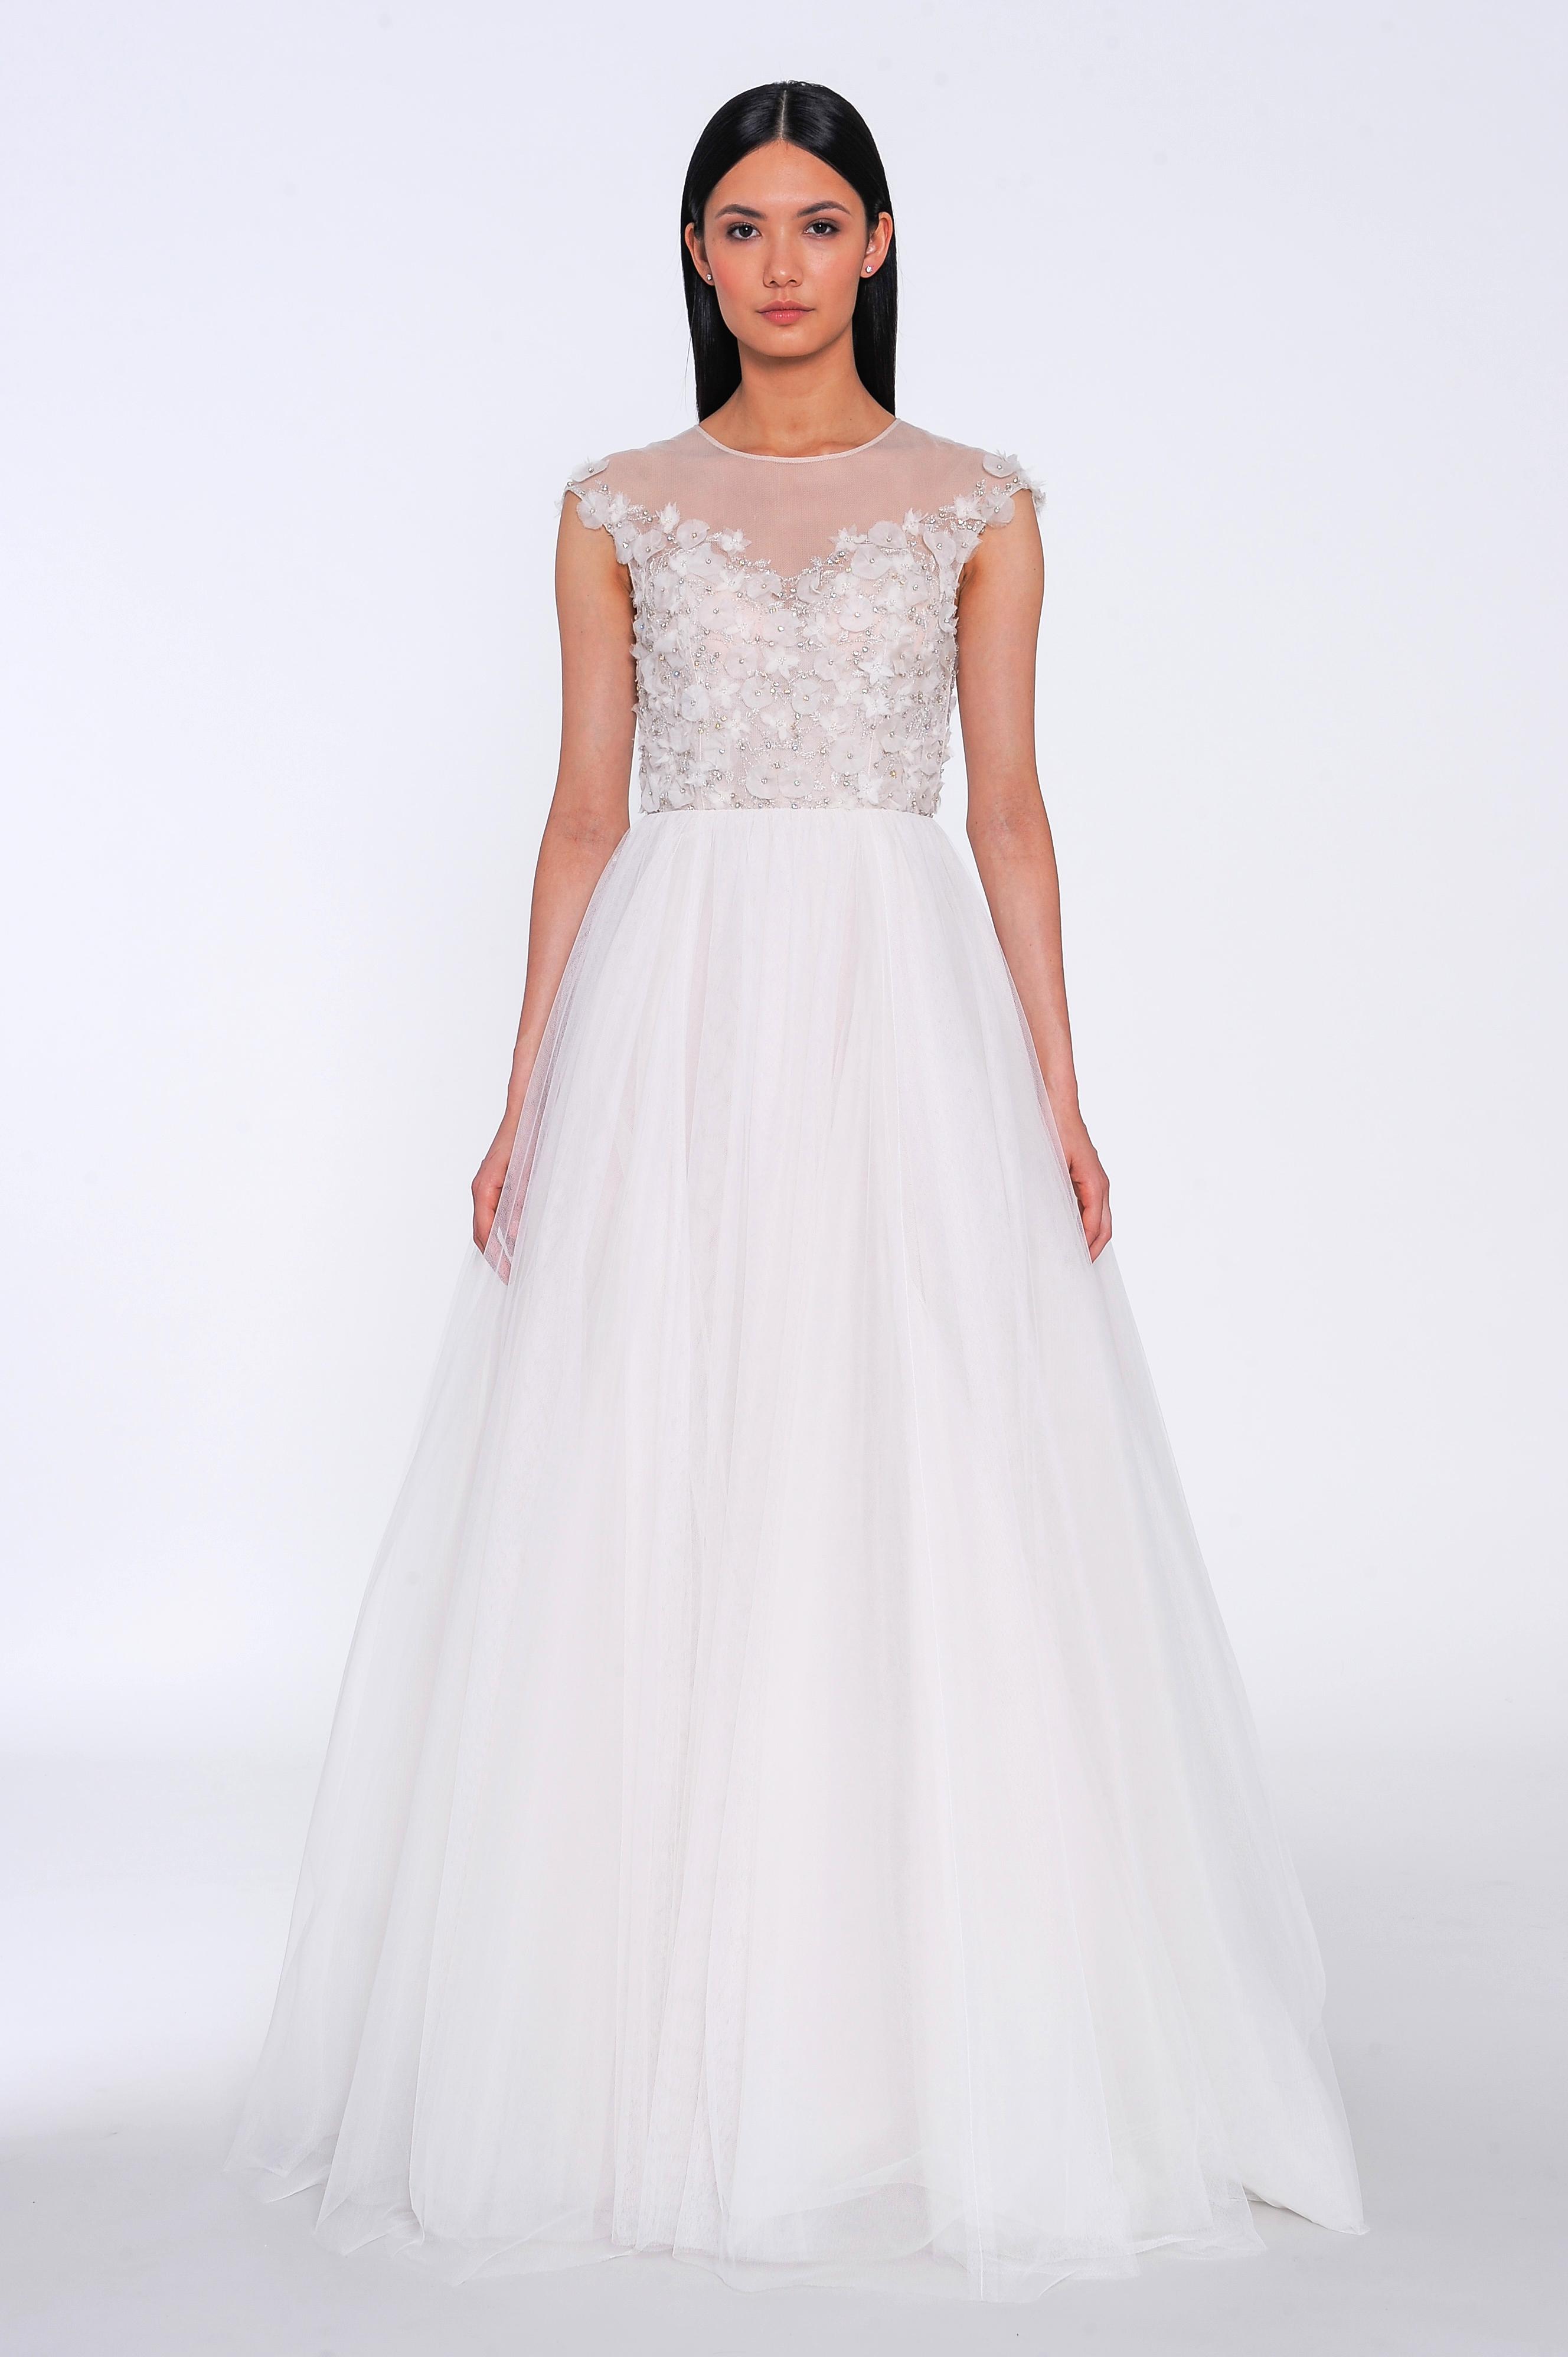 allison webb wedding dress spring 2019 illusion